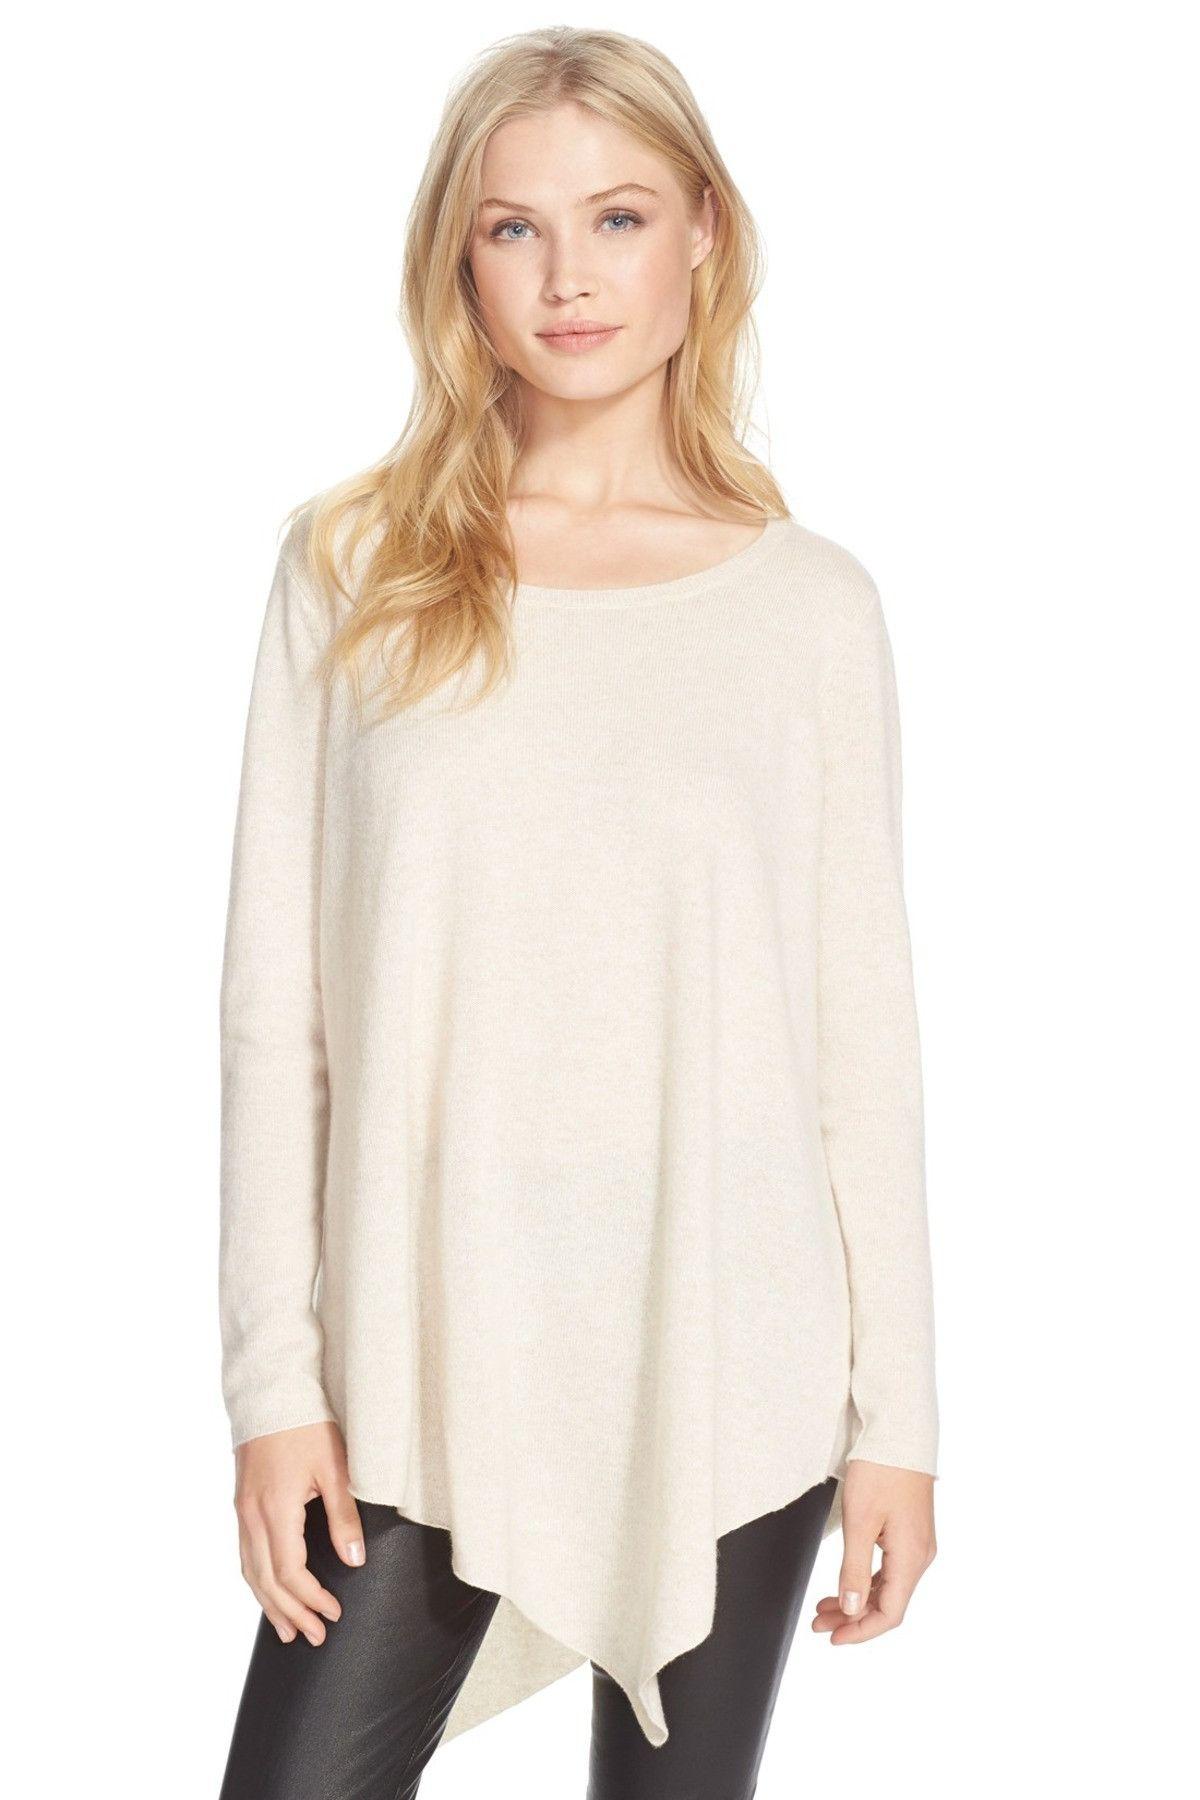 Joie | 'Tambrel' Asymmetrical Tunic Sweater | Tunic sweater ...